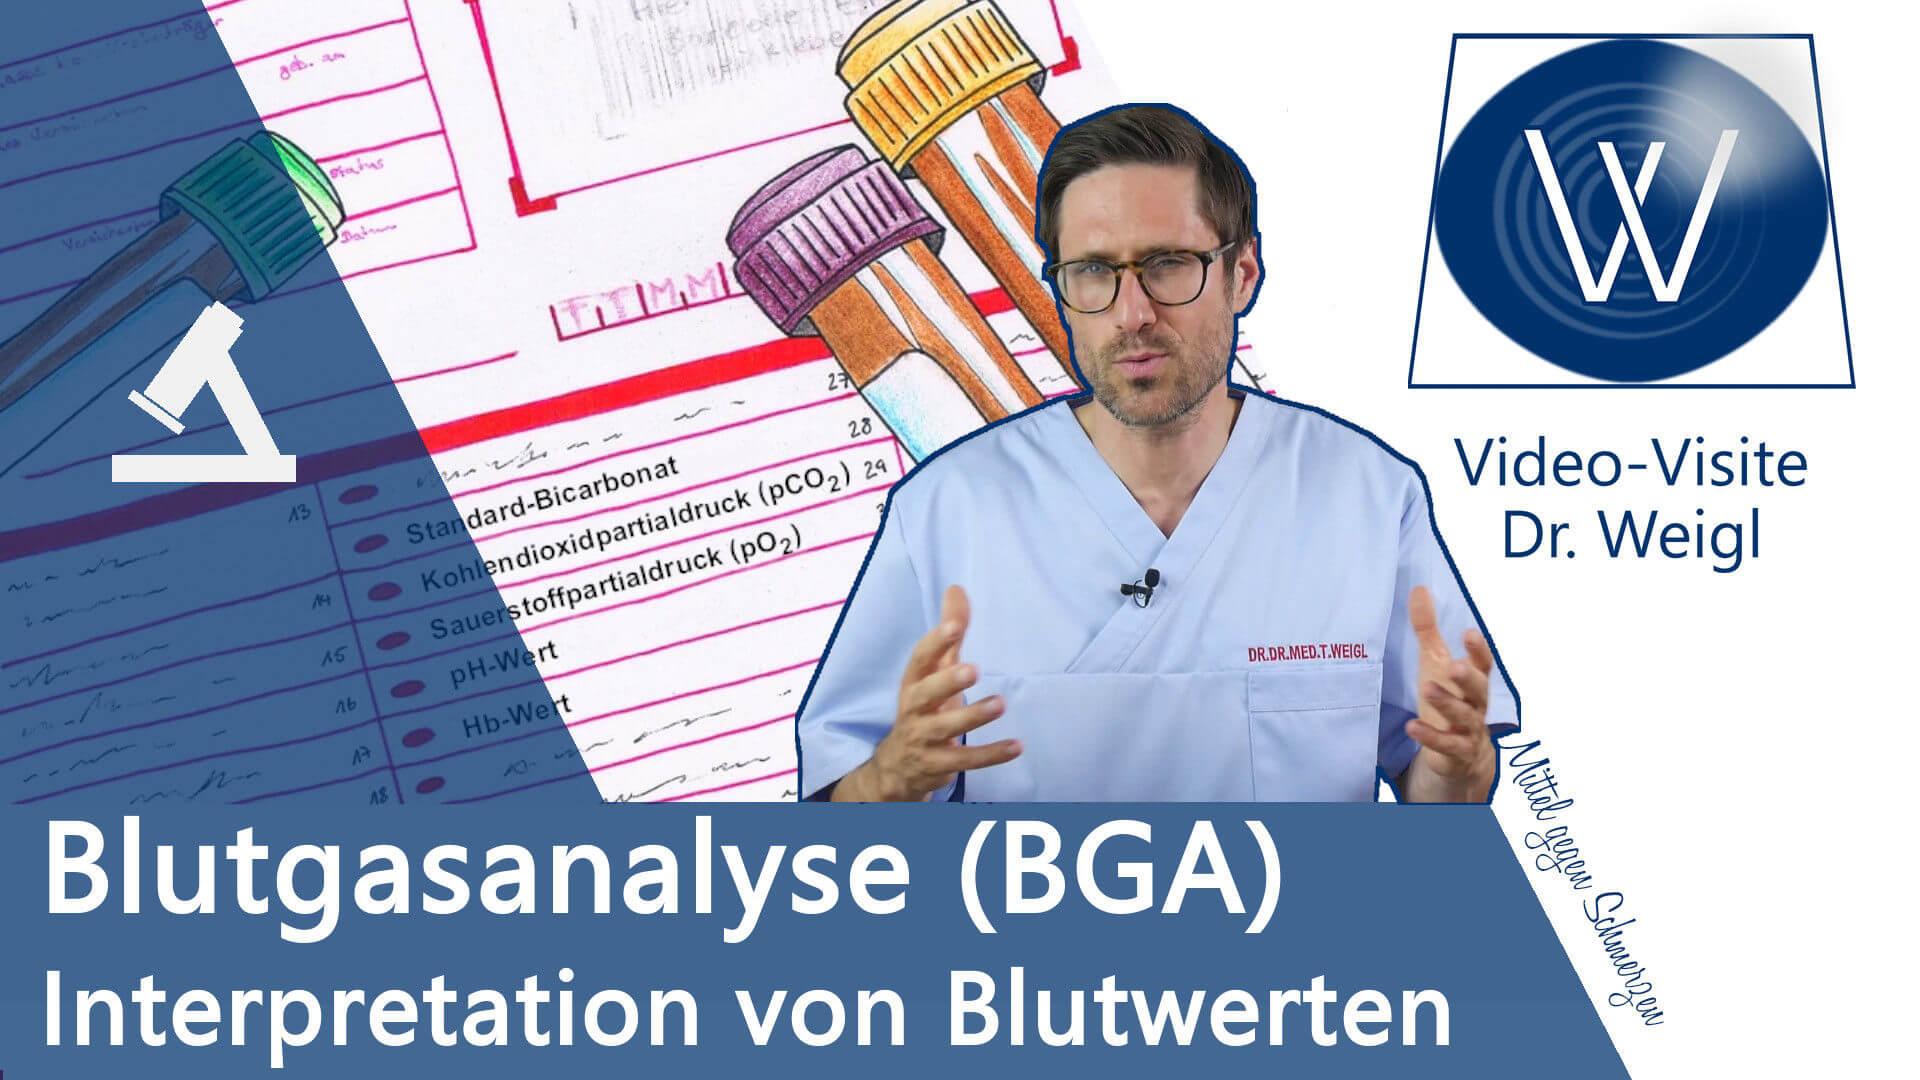 Die Blutgasanalyse (BGA) – Wichtige Notfall-Diagnostik